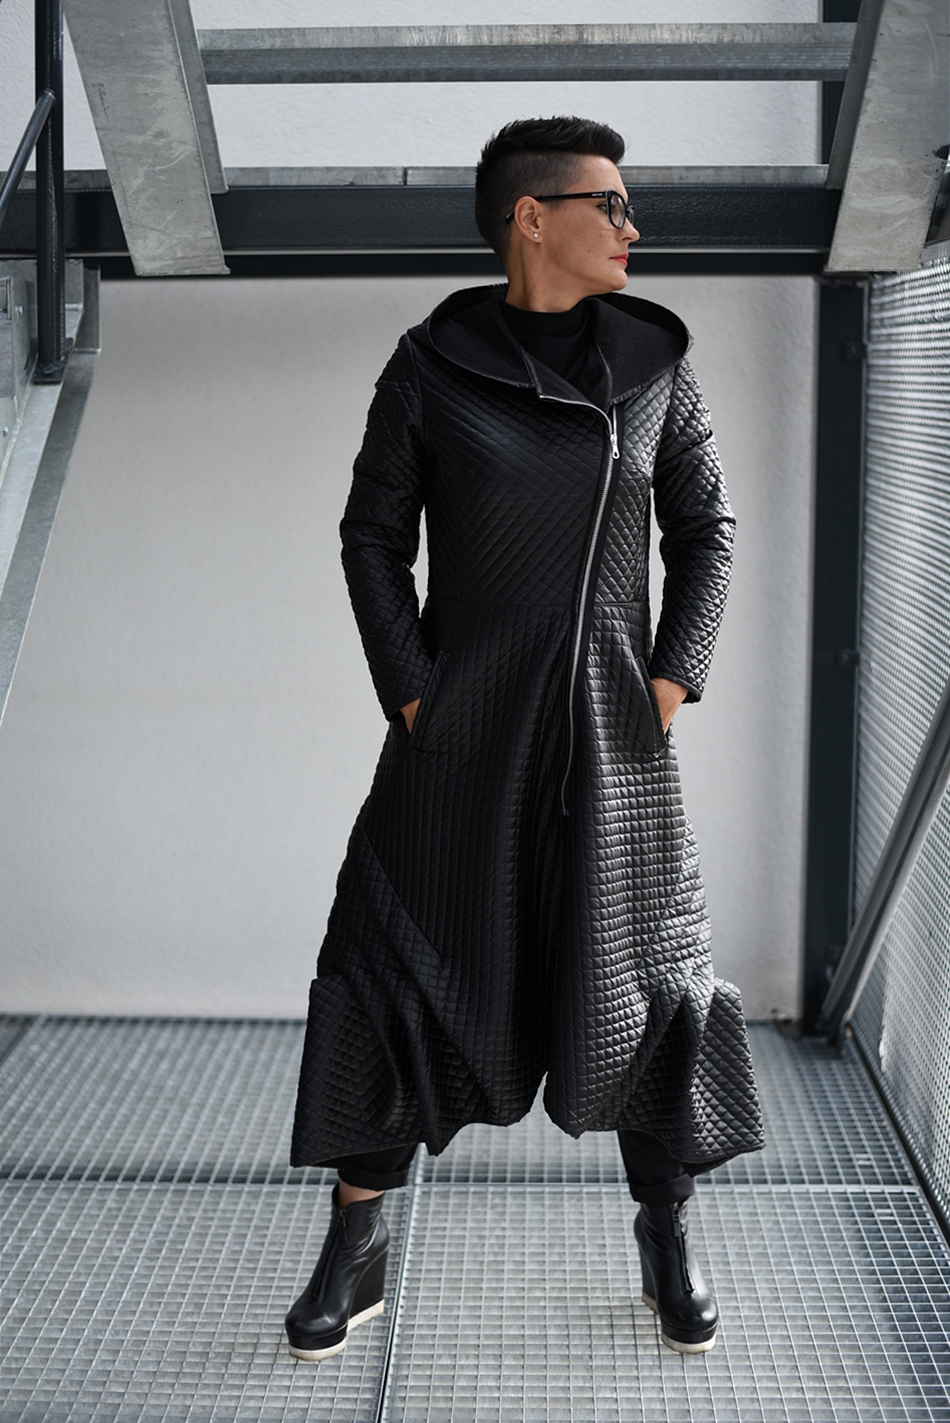 Broth_design_clothes_063